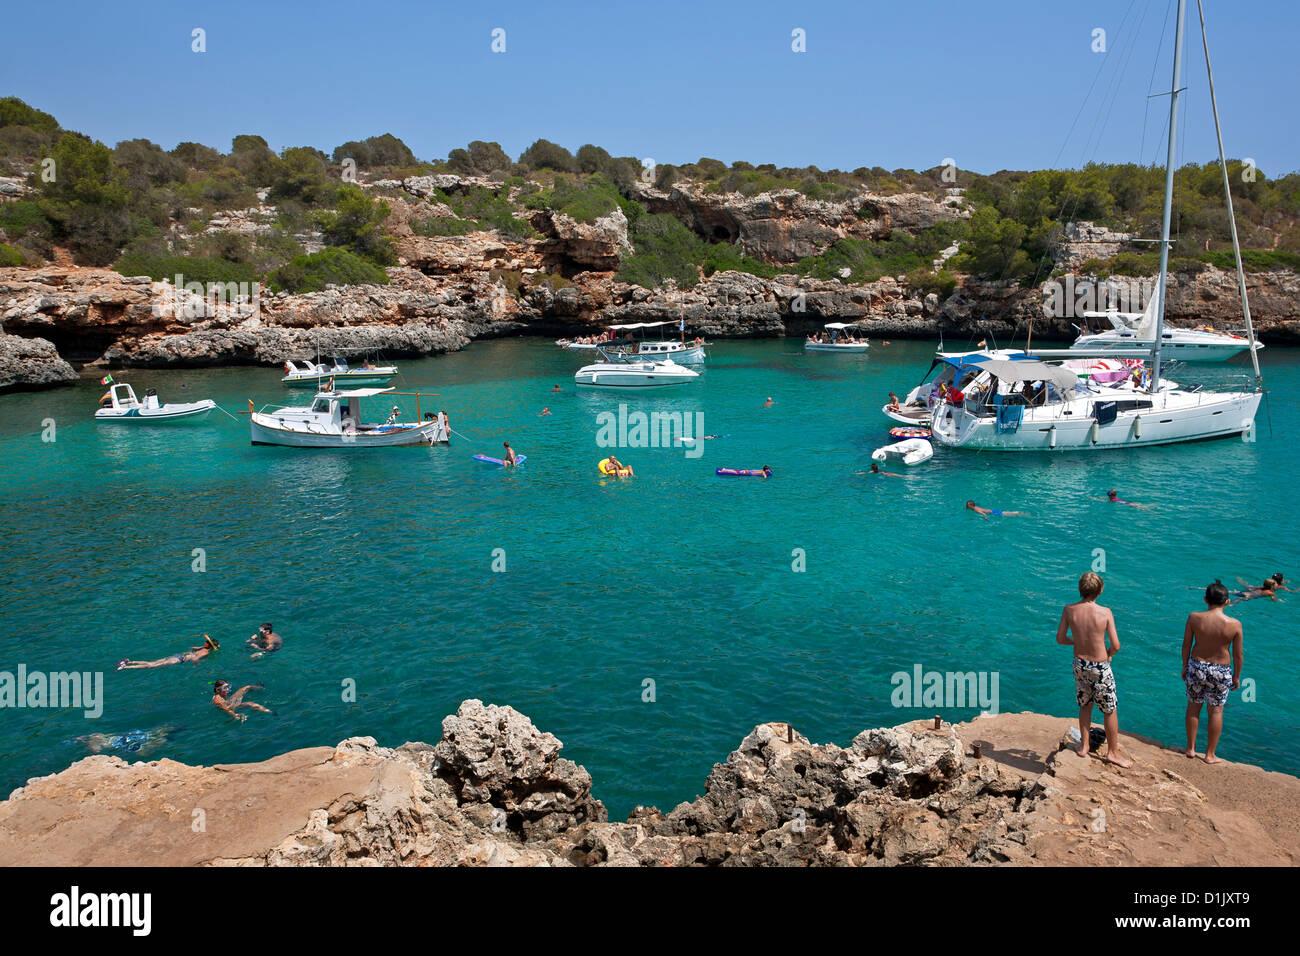 Cala Sa Nau. Mallorca Island. Spain - Stock Image